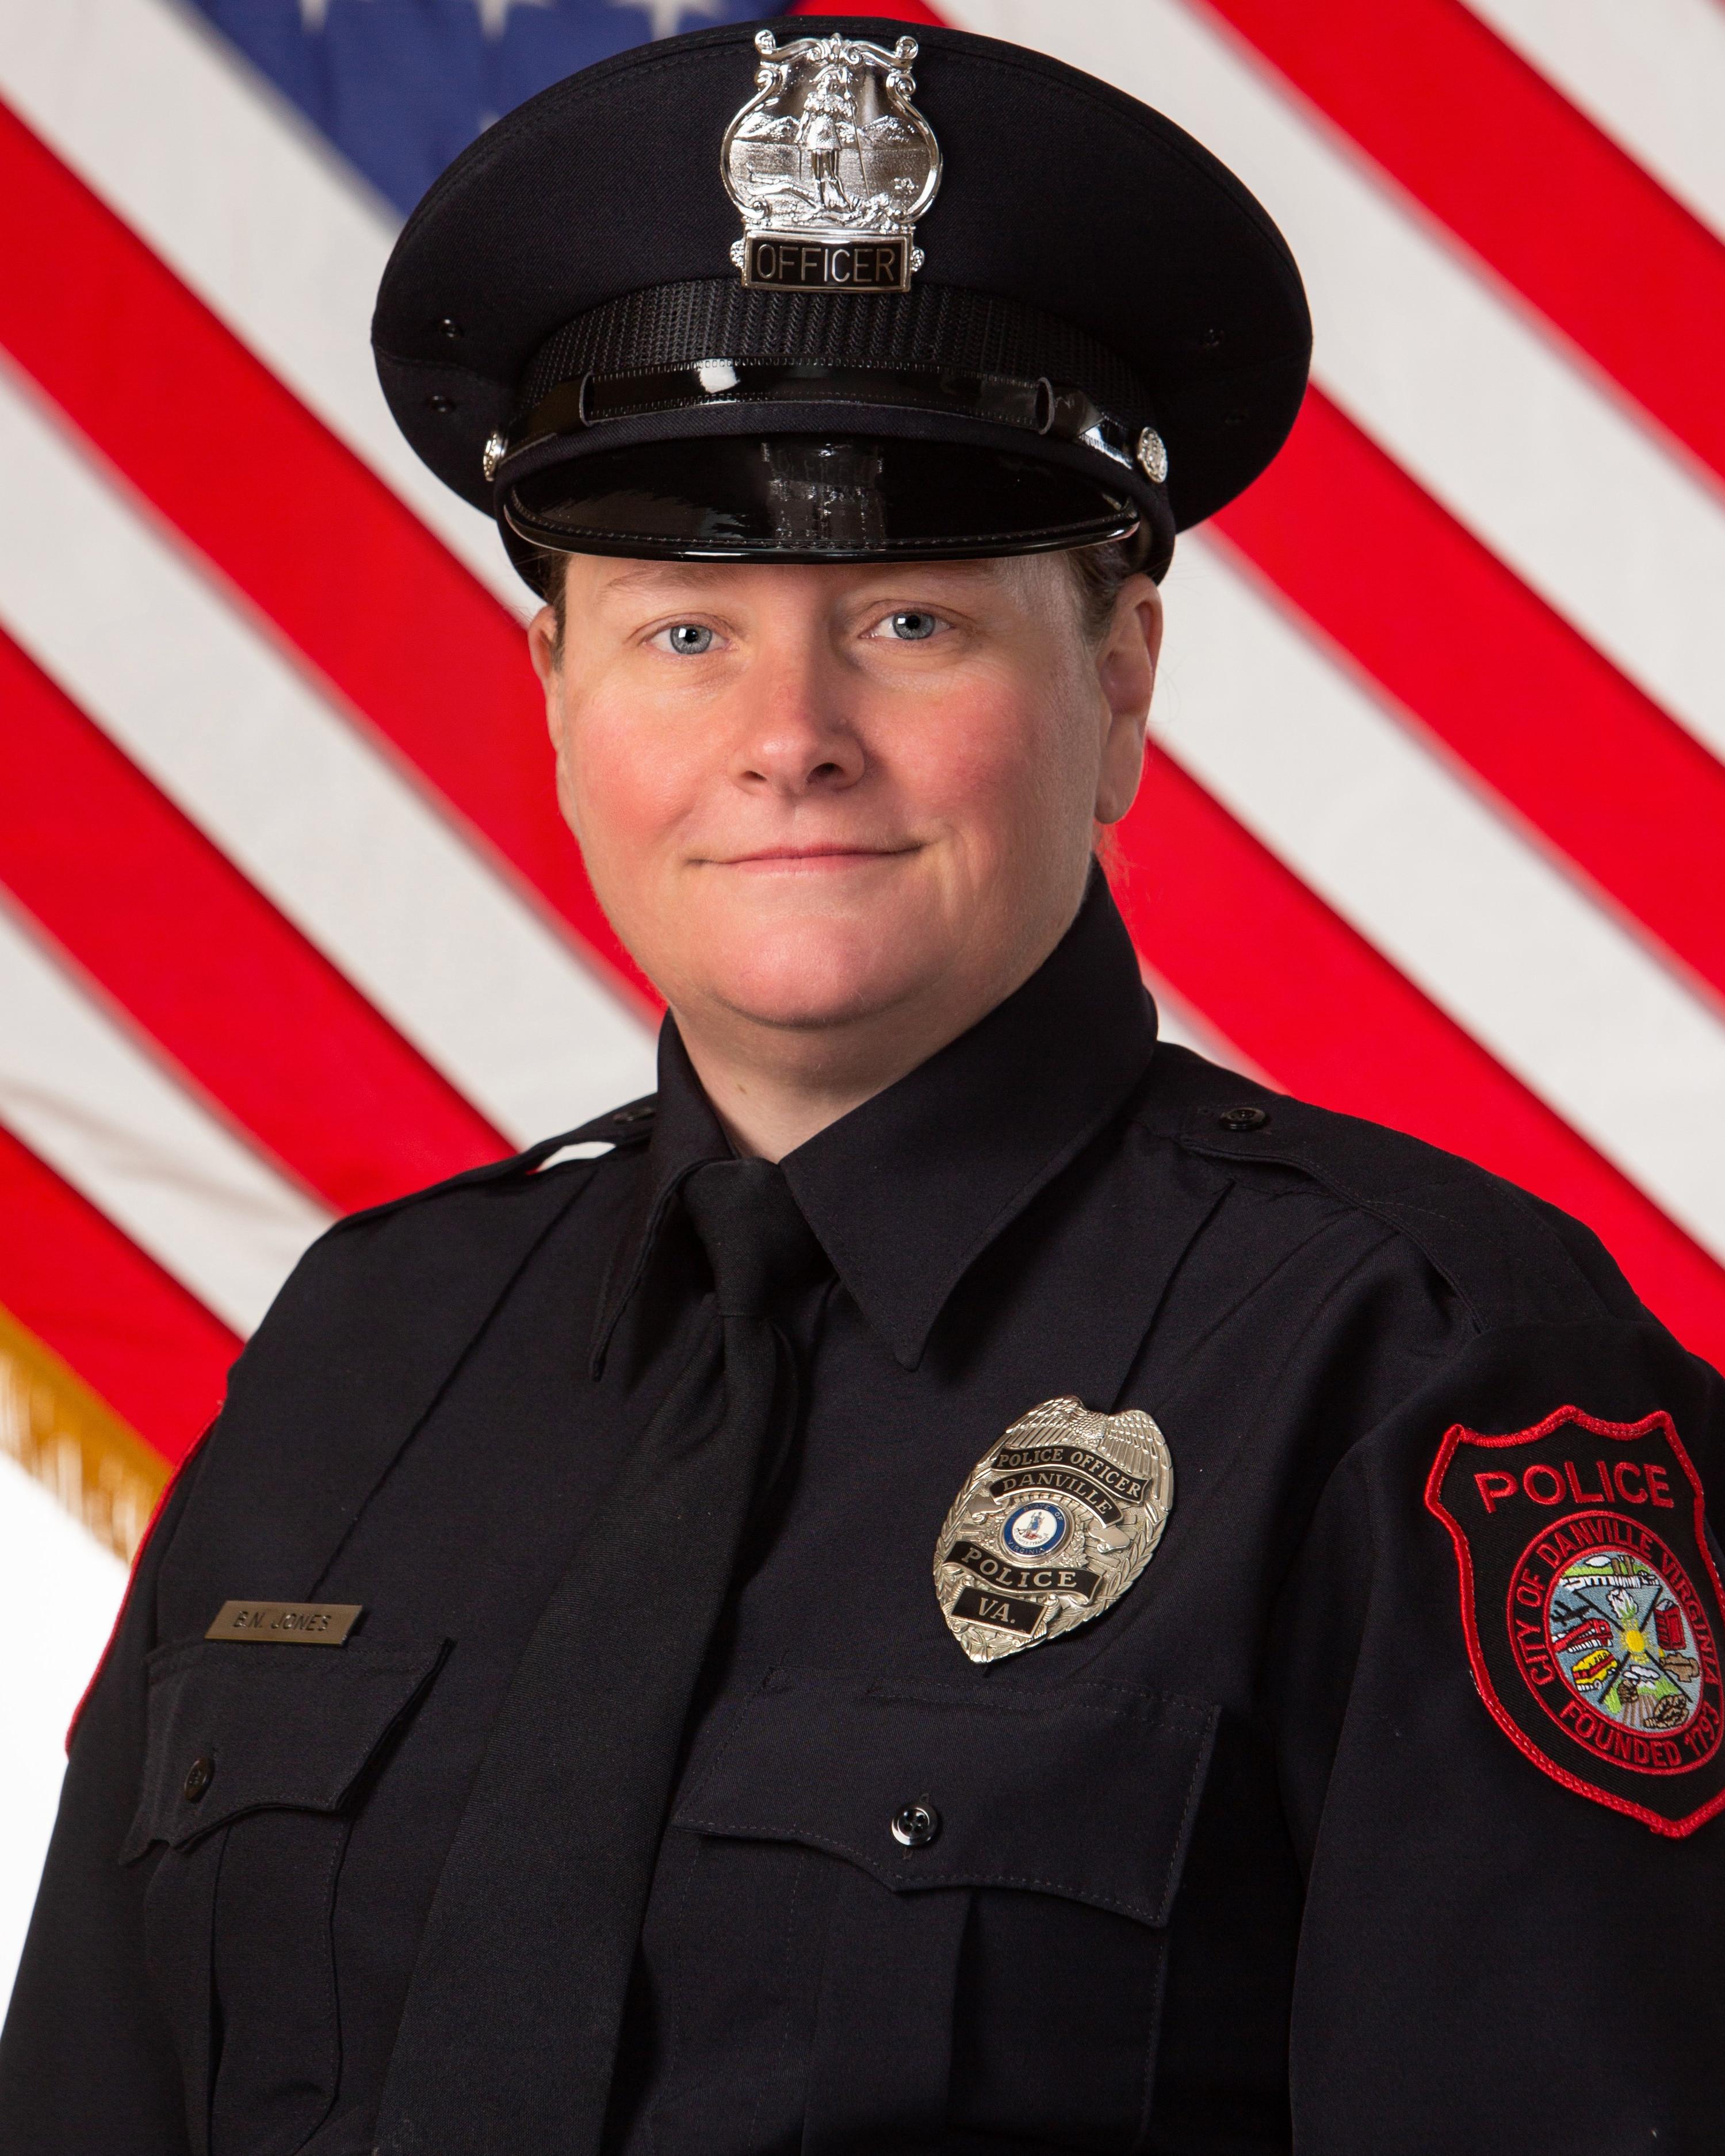 Police Officer Bonnie  Nicole Jones | Danville Police Department, Virginia